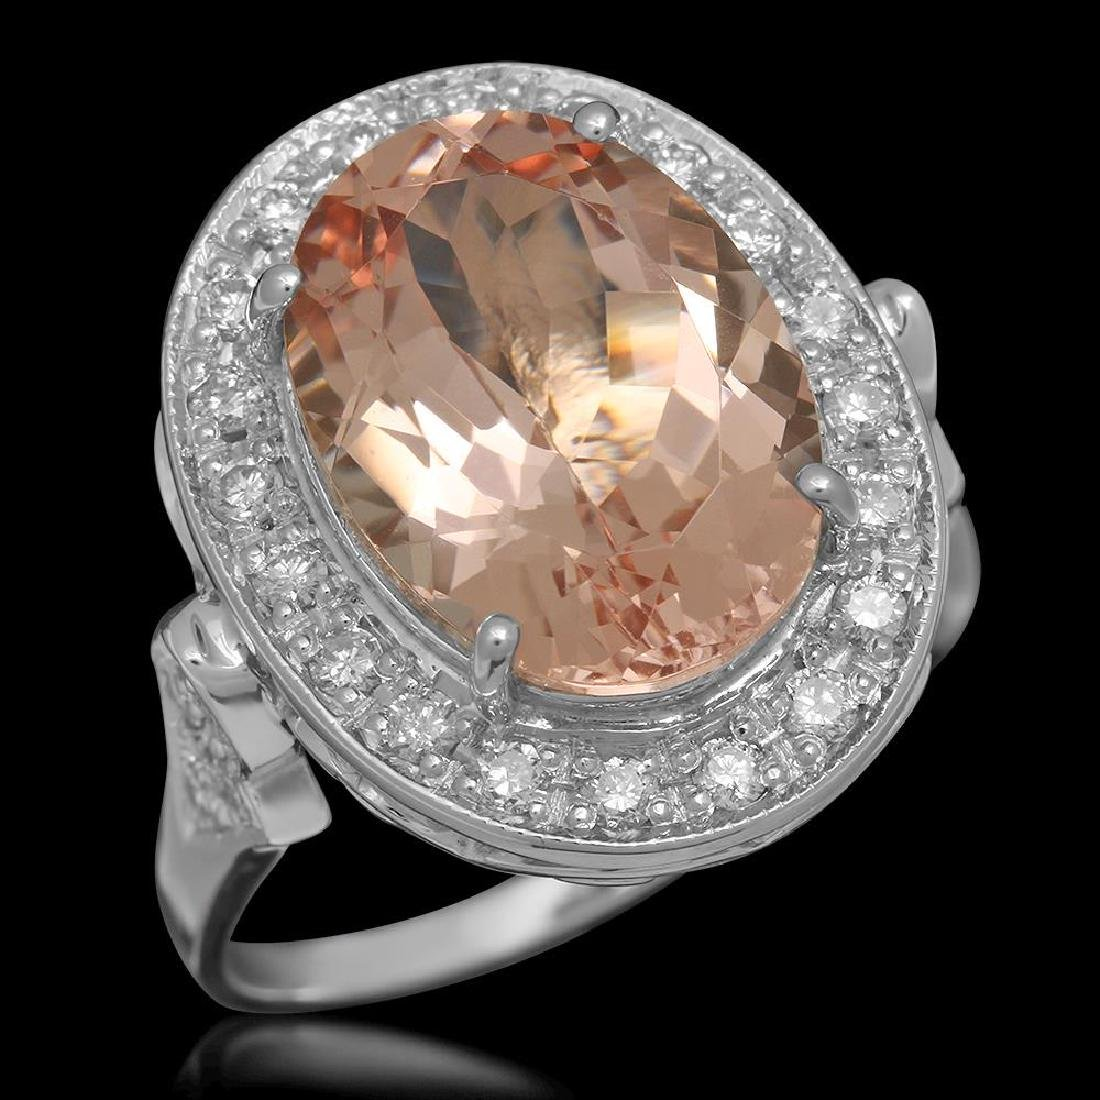 14K Gold 5.97ct Morganite 0.52ct Diamond Ring